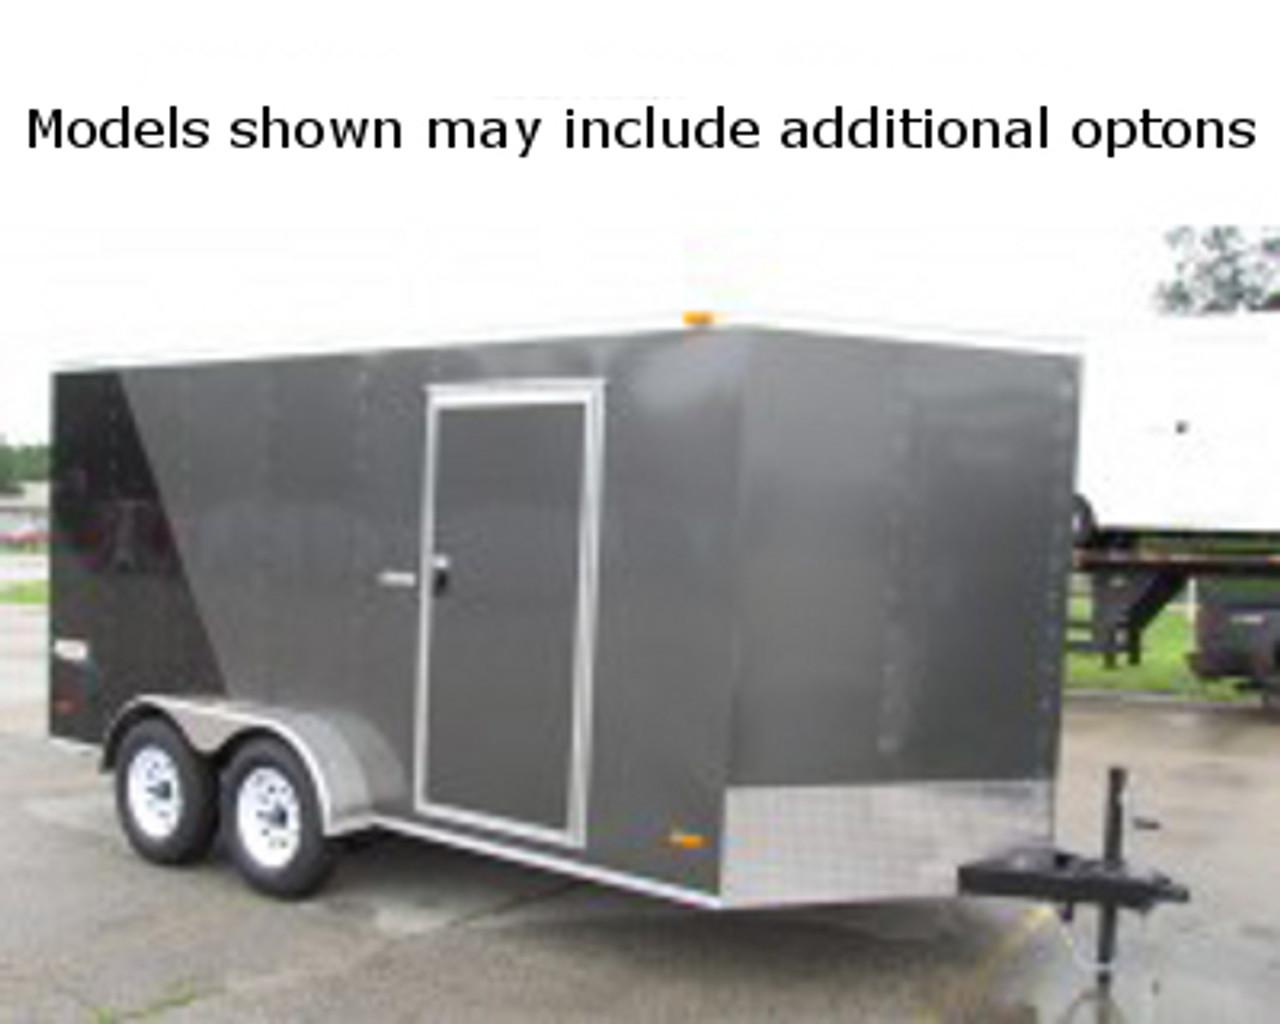 SC10220TA3 --- 8.5' X 20' Enclosed Tandem Trailer with Rear Ramp Door - Bravo